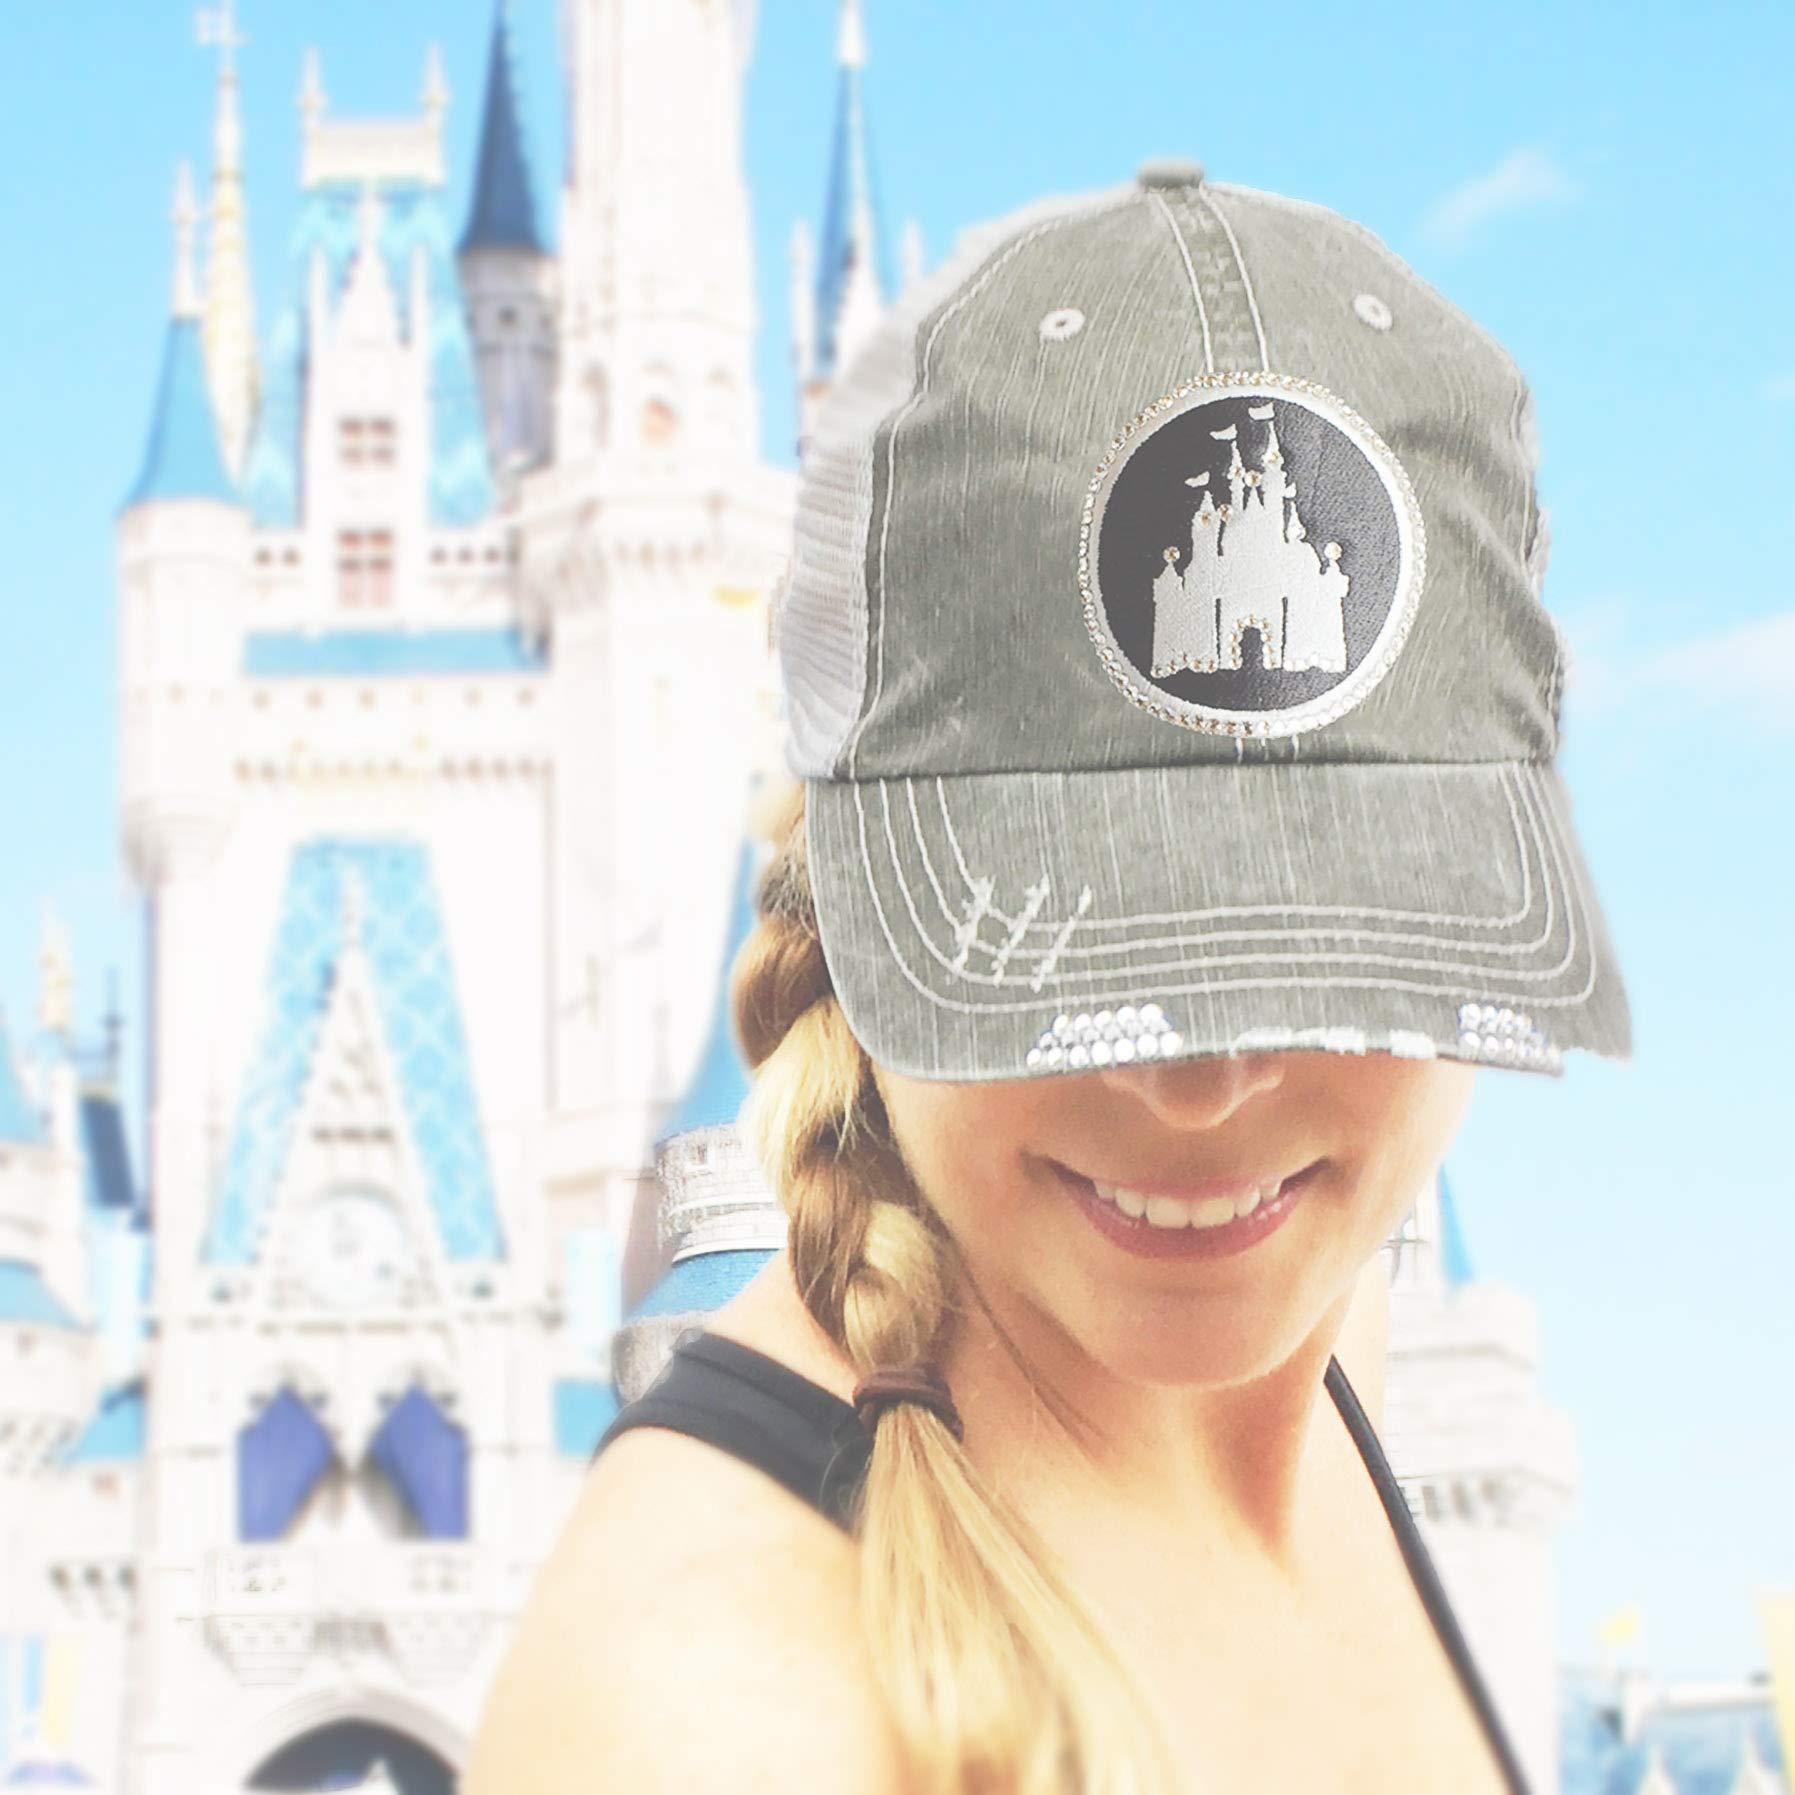 Disney High Ponytail Hat Bedazzled Mesh Baseball Cap Swarovski Crystal Bling Gray by Elivata (Image #3)